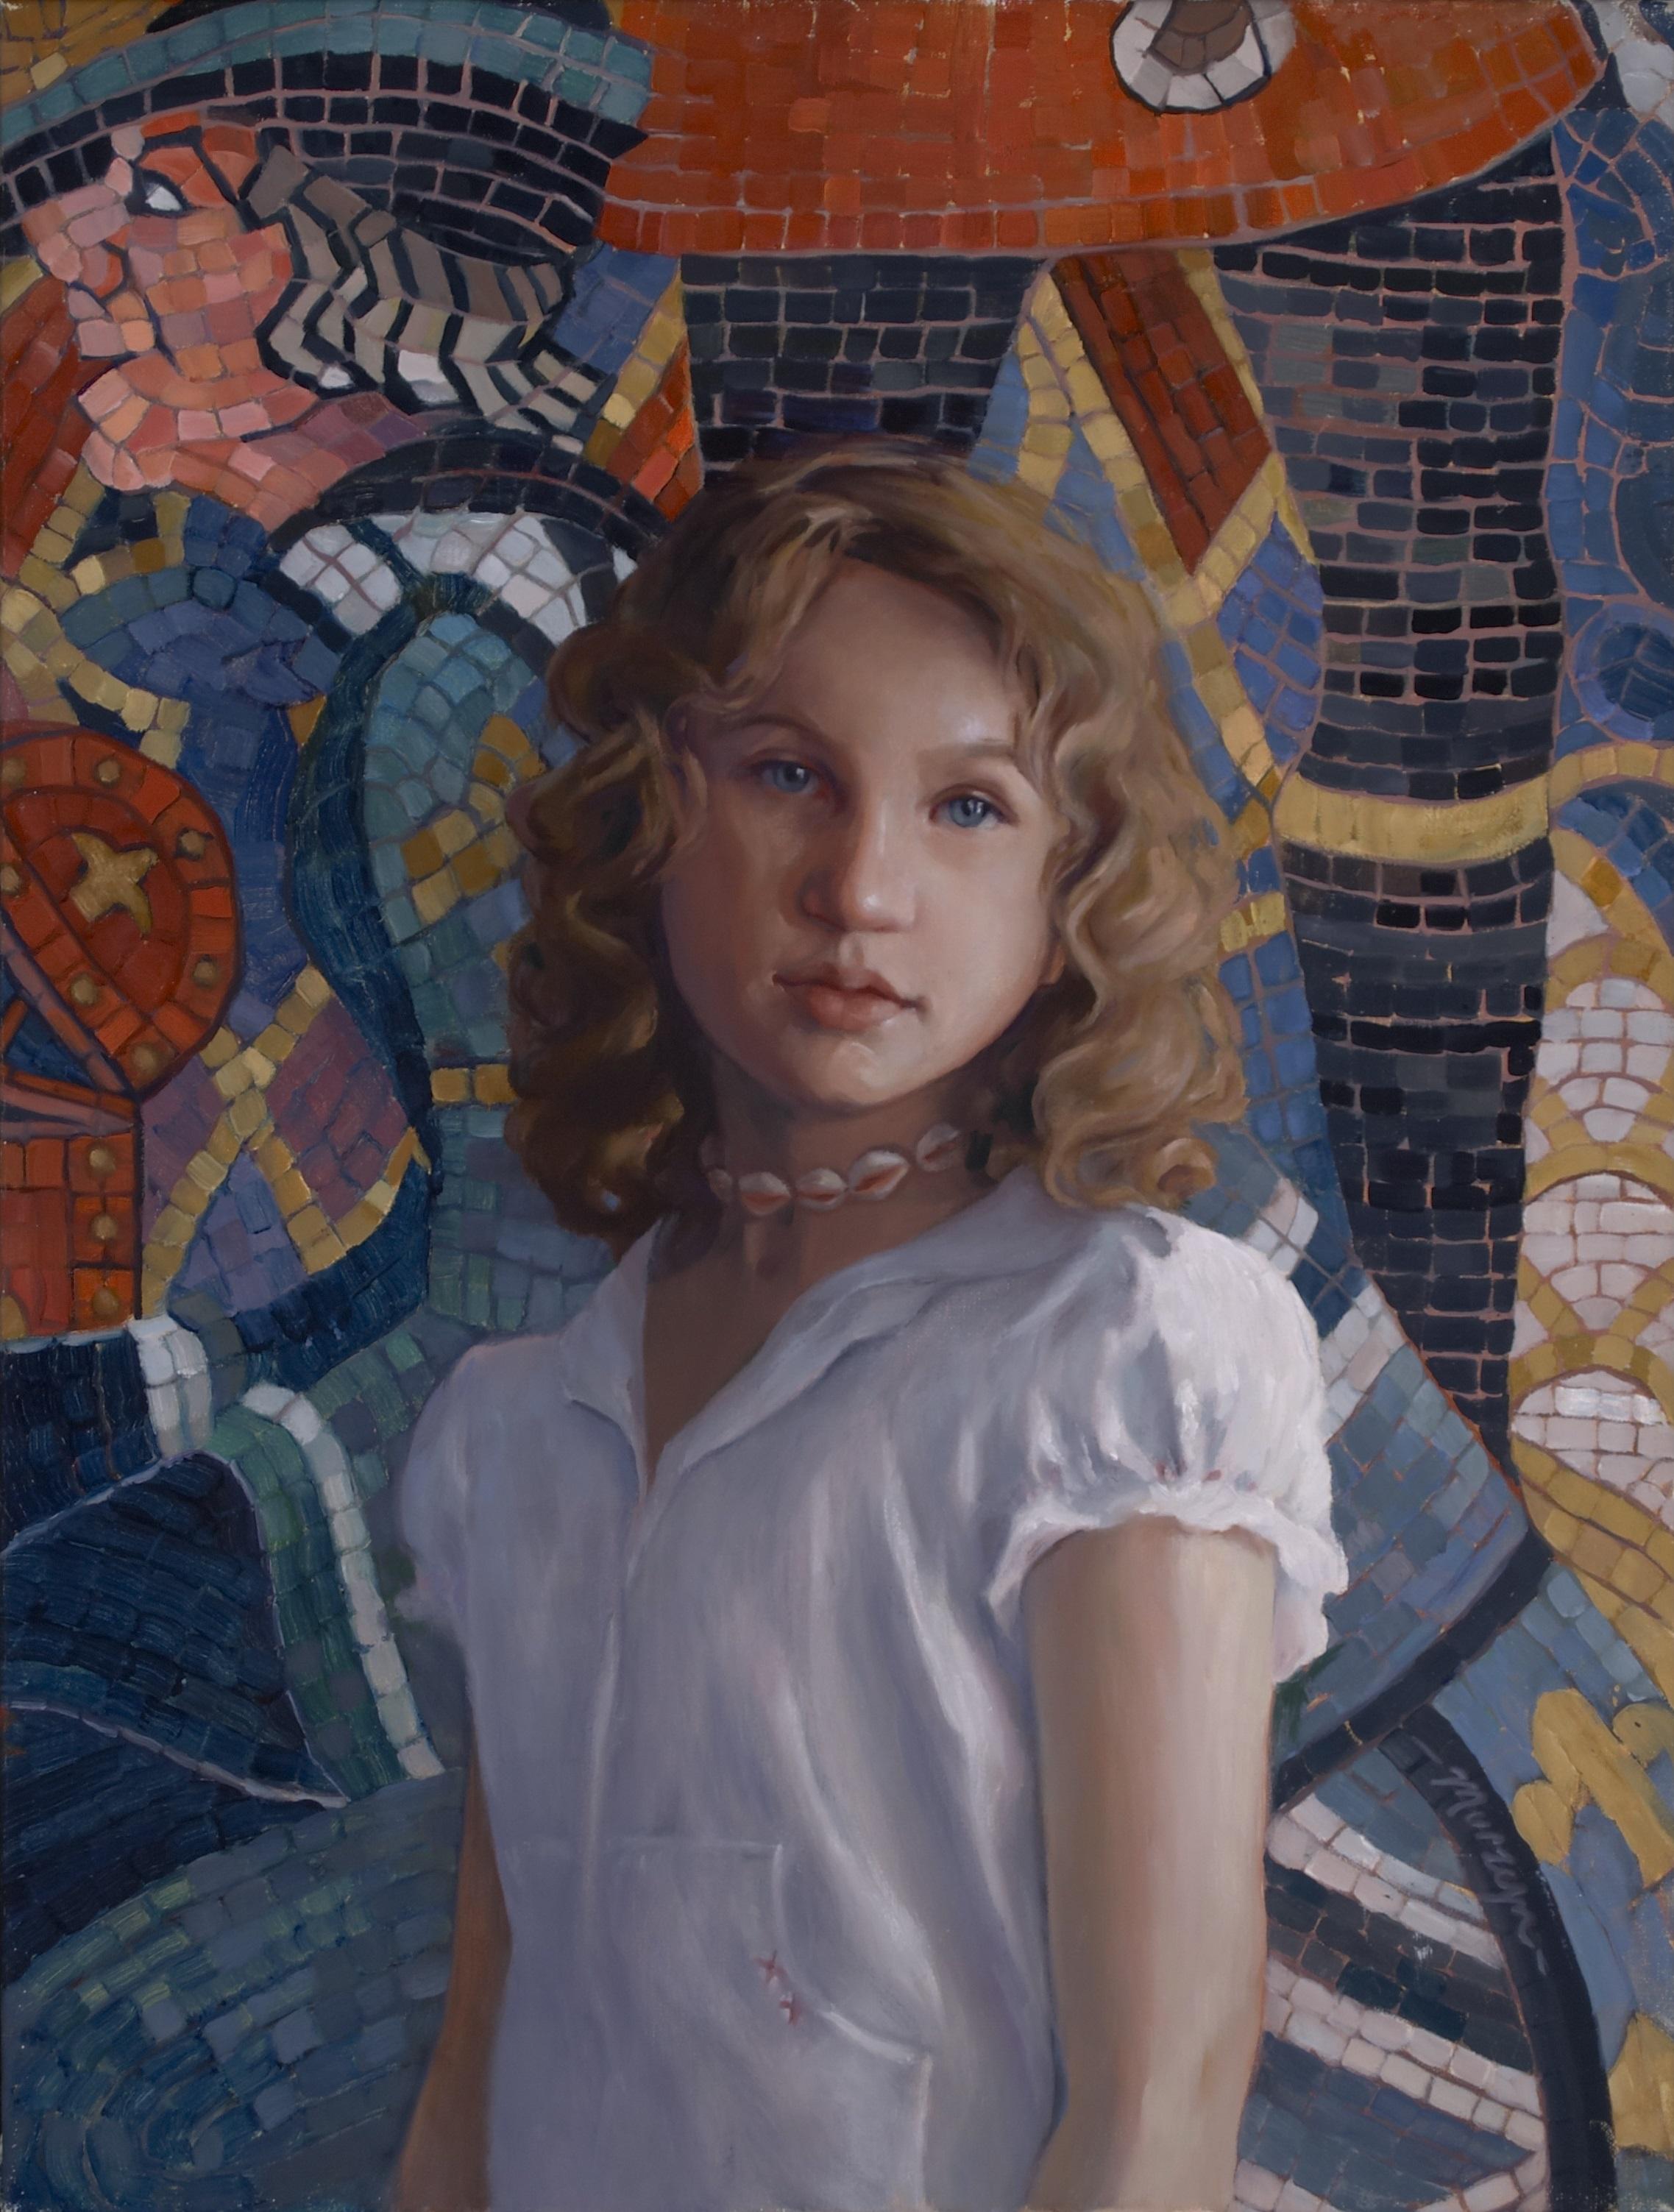 Margot & Mosaic